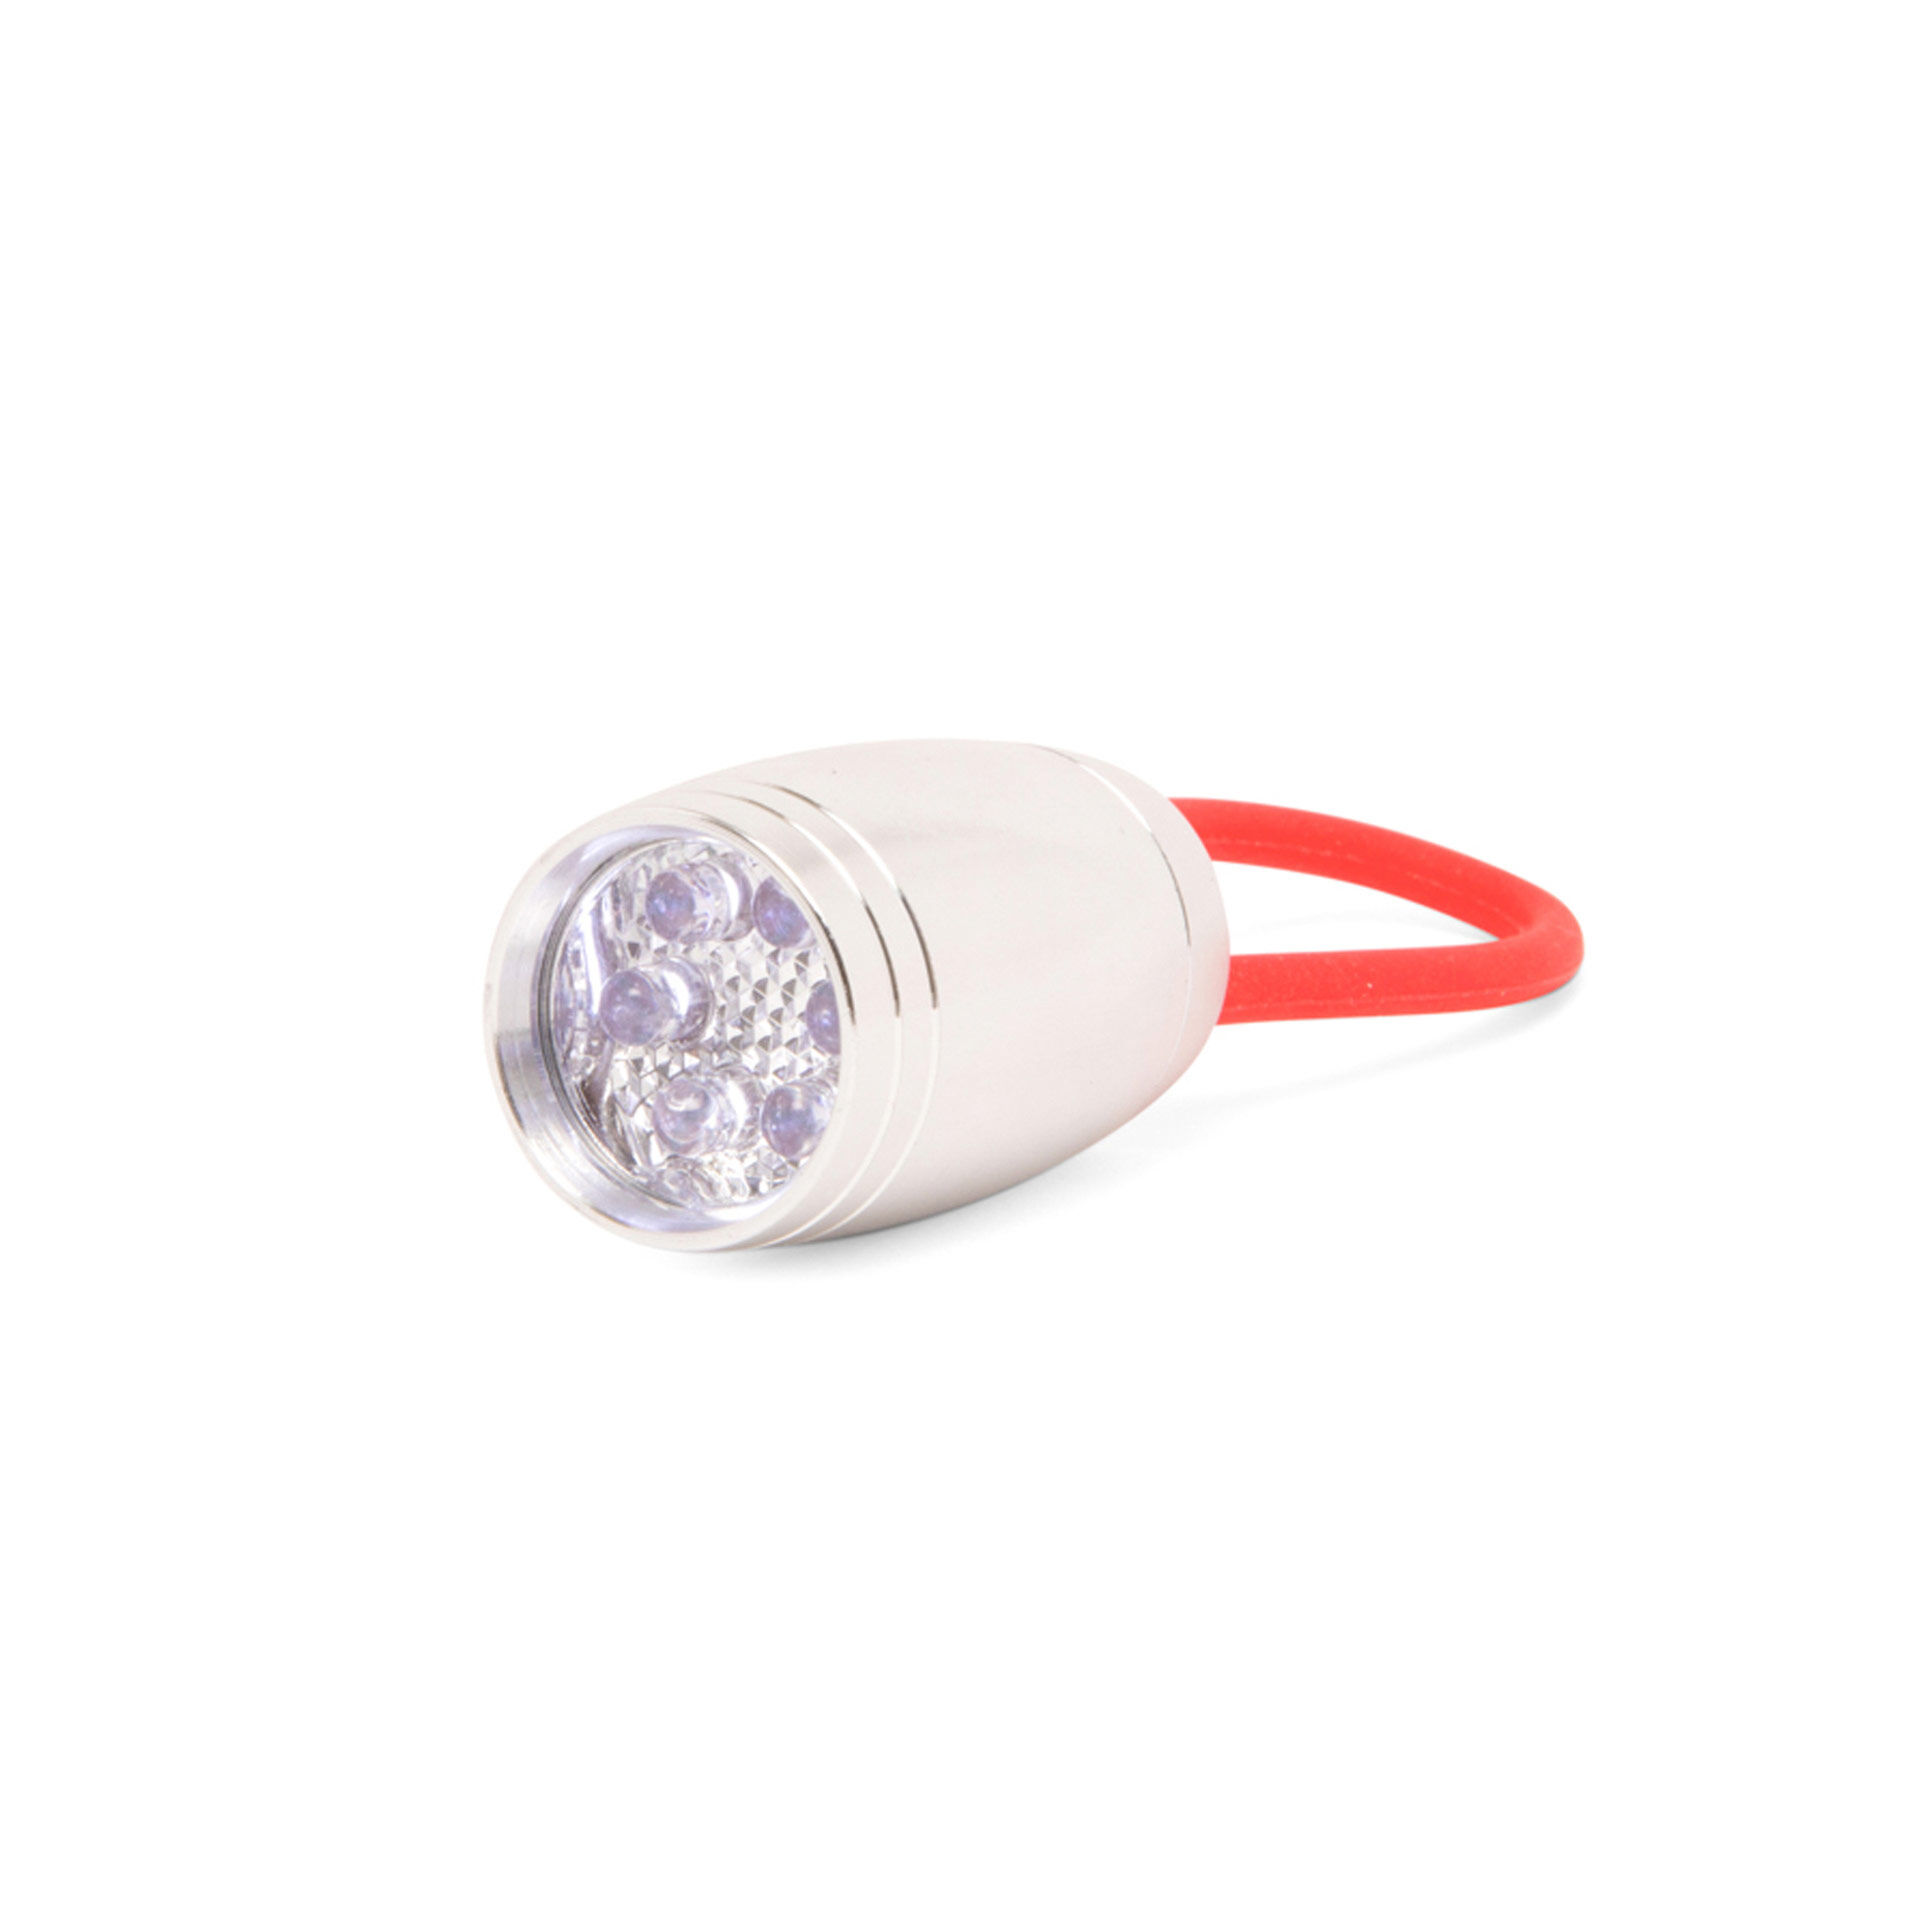 Mini torche multifonction 6 LED - rouge, , large